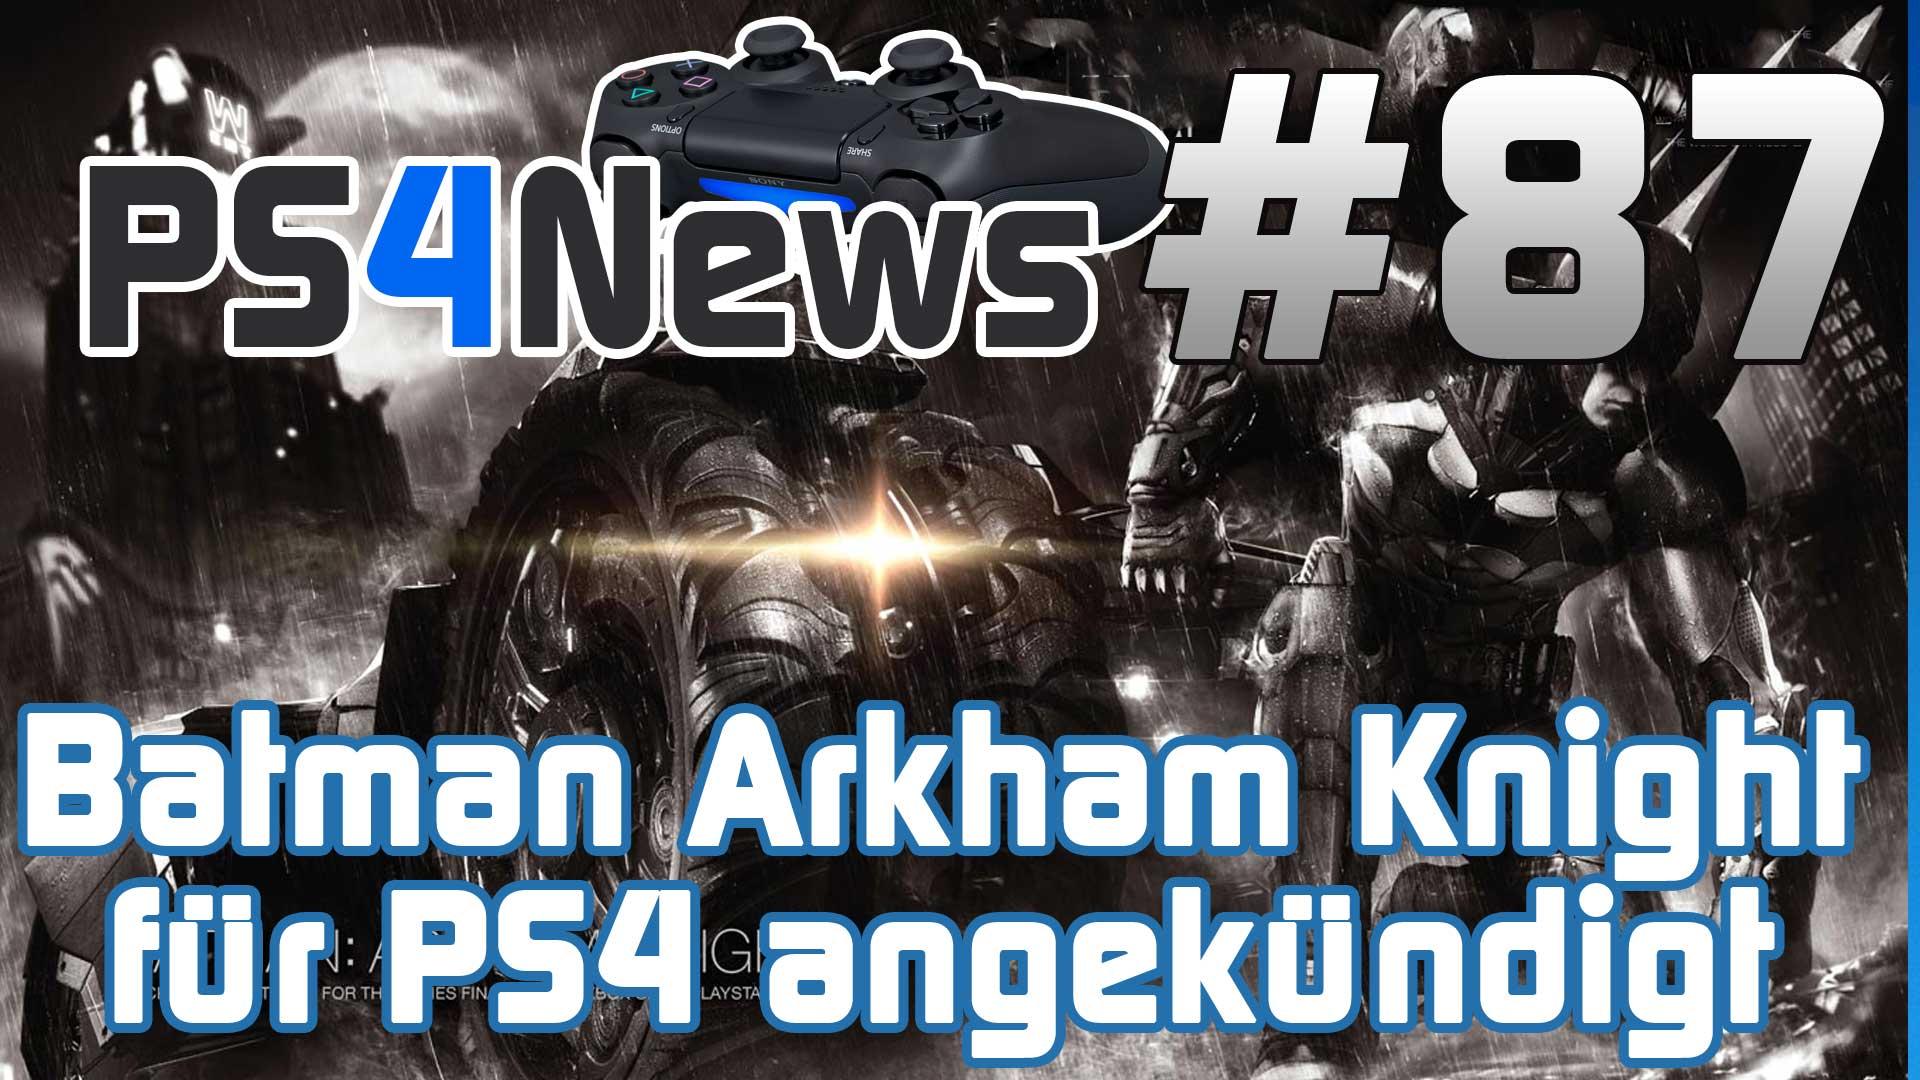 PS4NEWSFLASH: Batman Arkham Knight für PlayStation 4 angekündigt